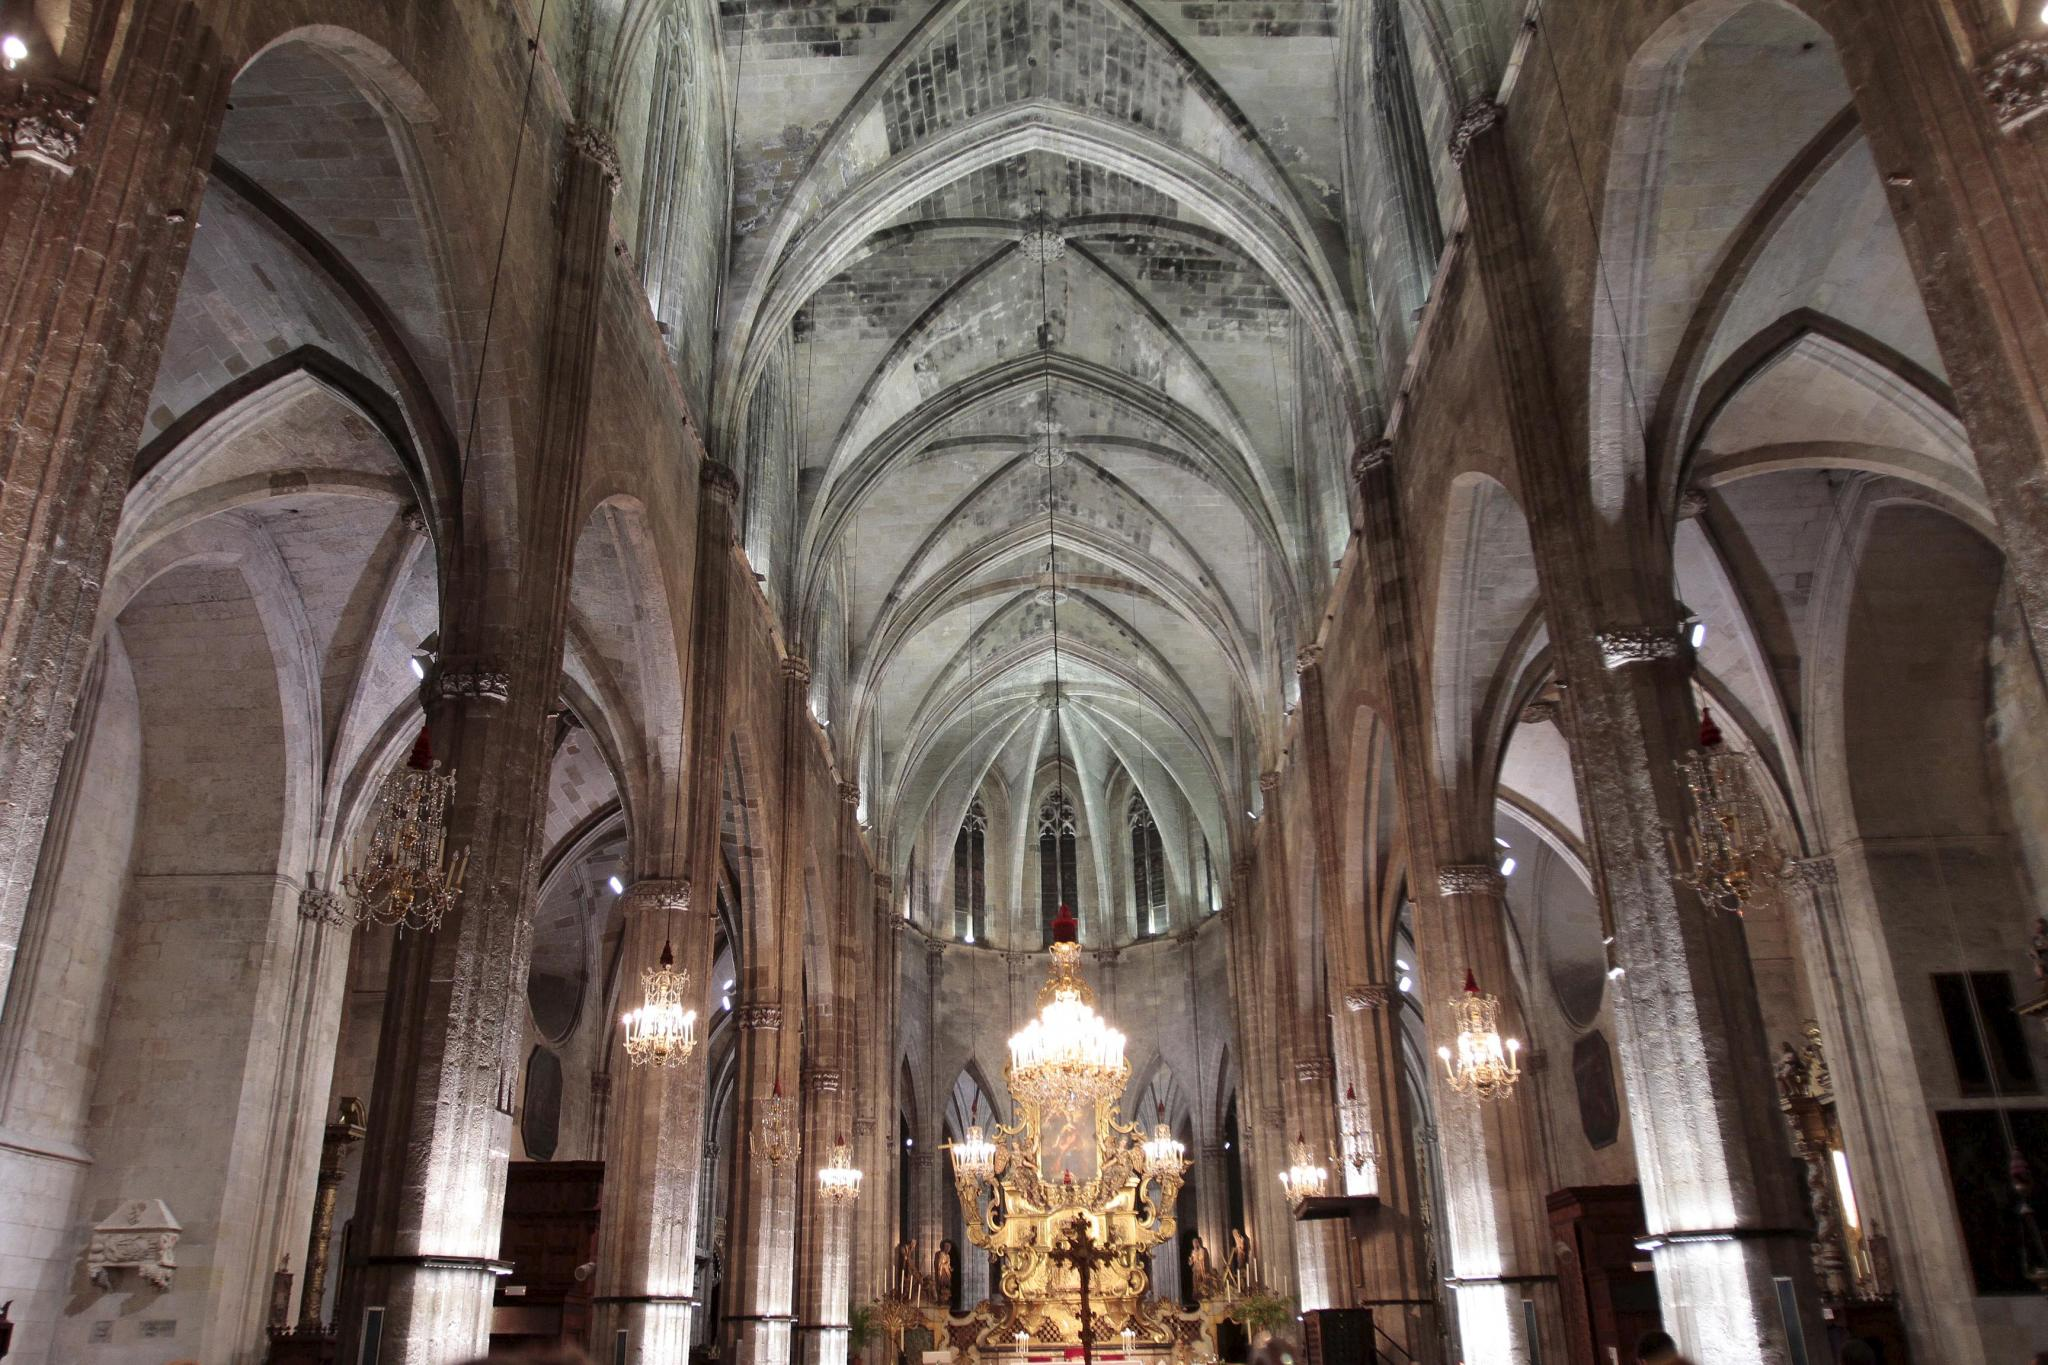 Nueva iluminaci n interior en la iglesia de santa eulalia - Iluminacion interior led ...